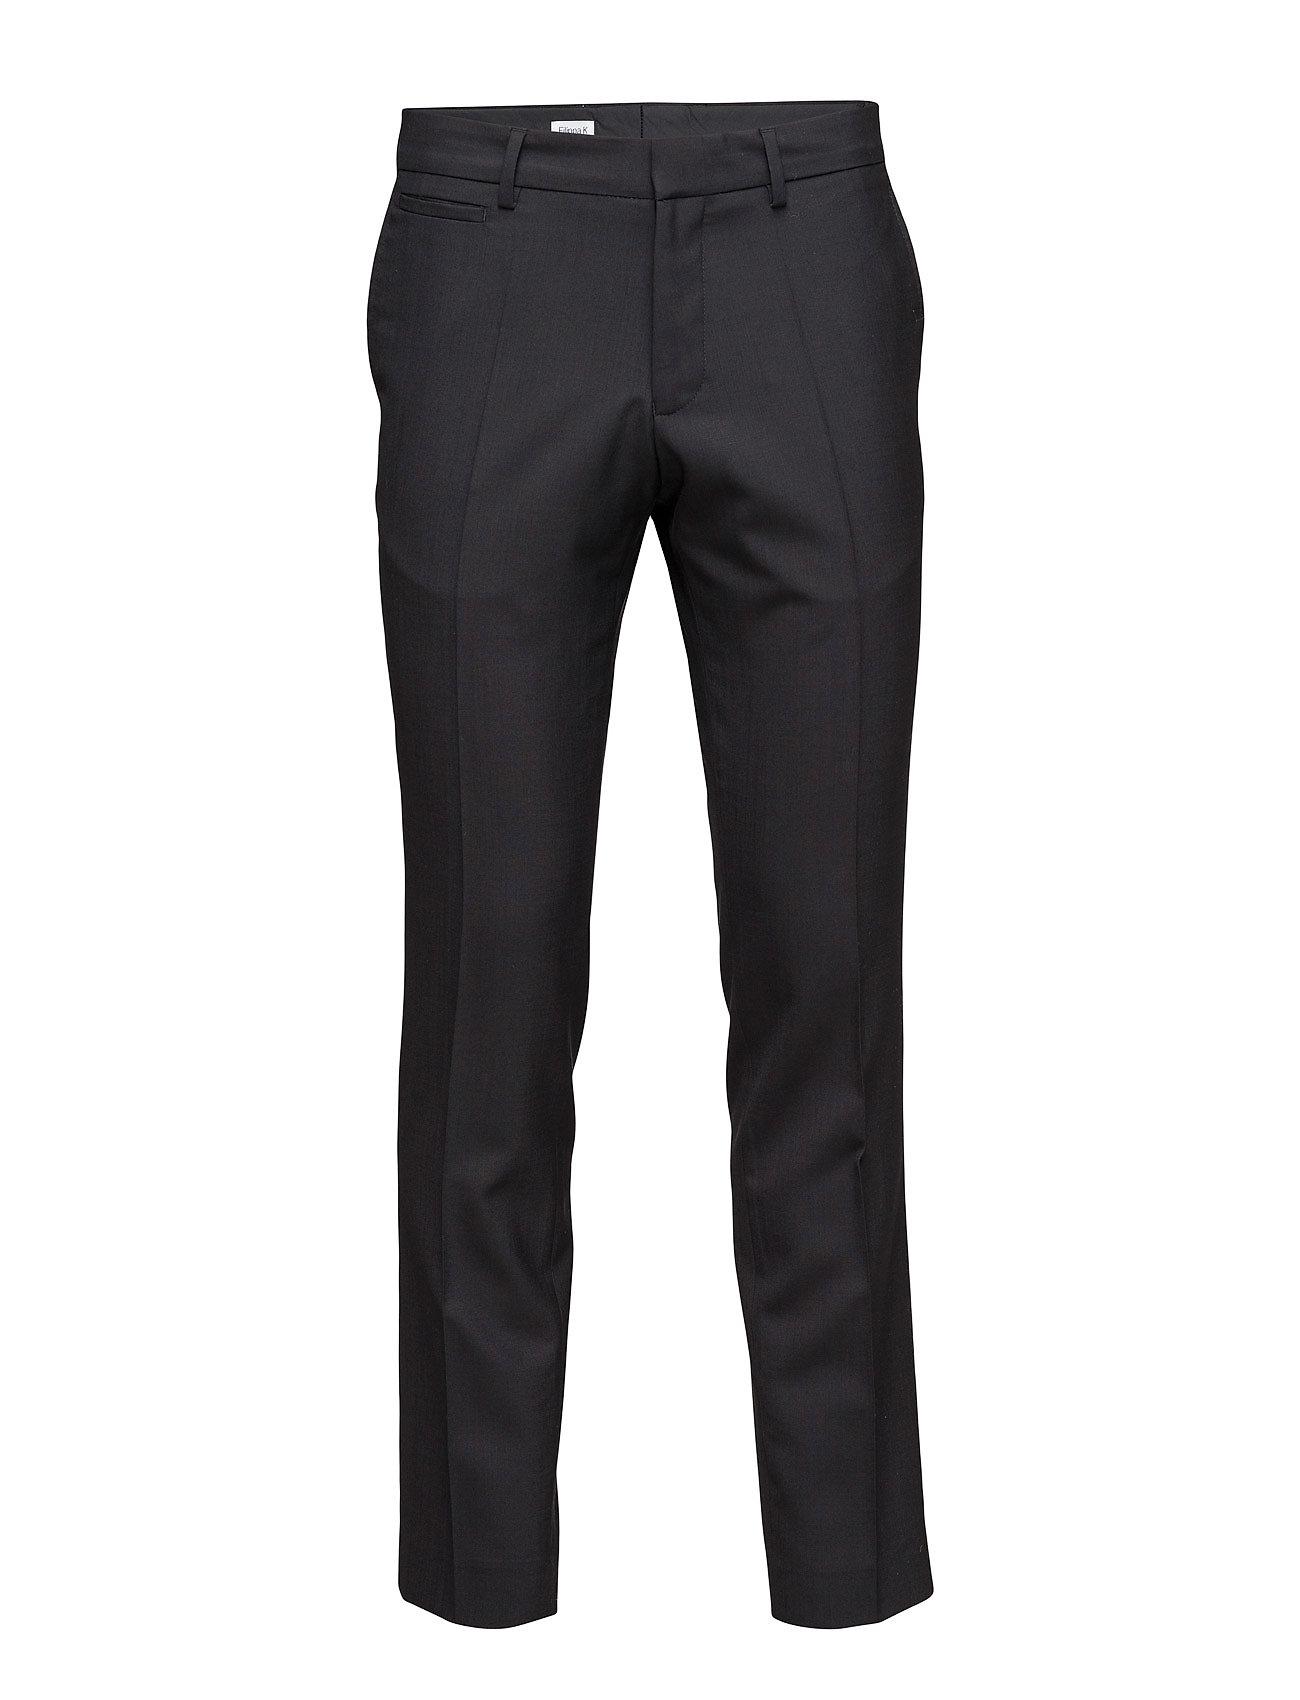 Filippa K M. Christian Cool Wool Slacks - BLACK